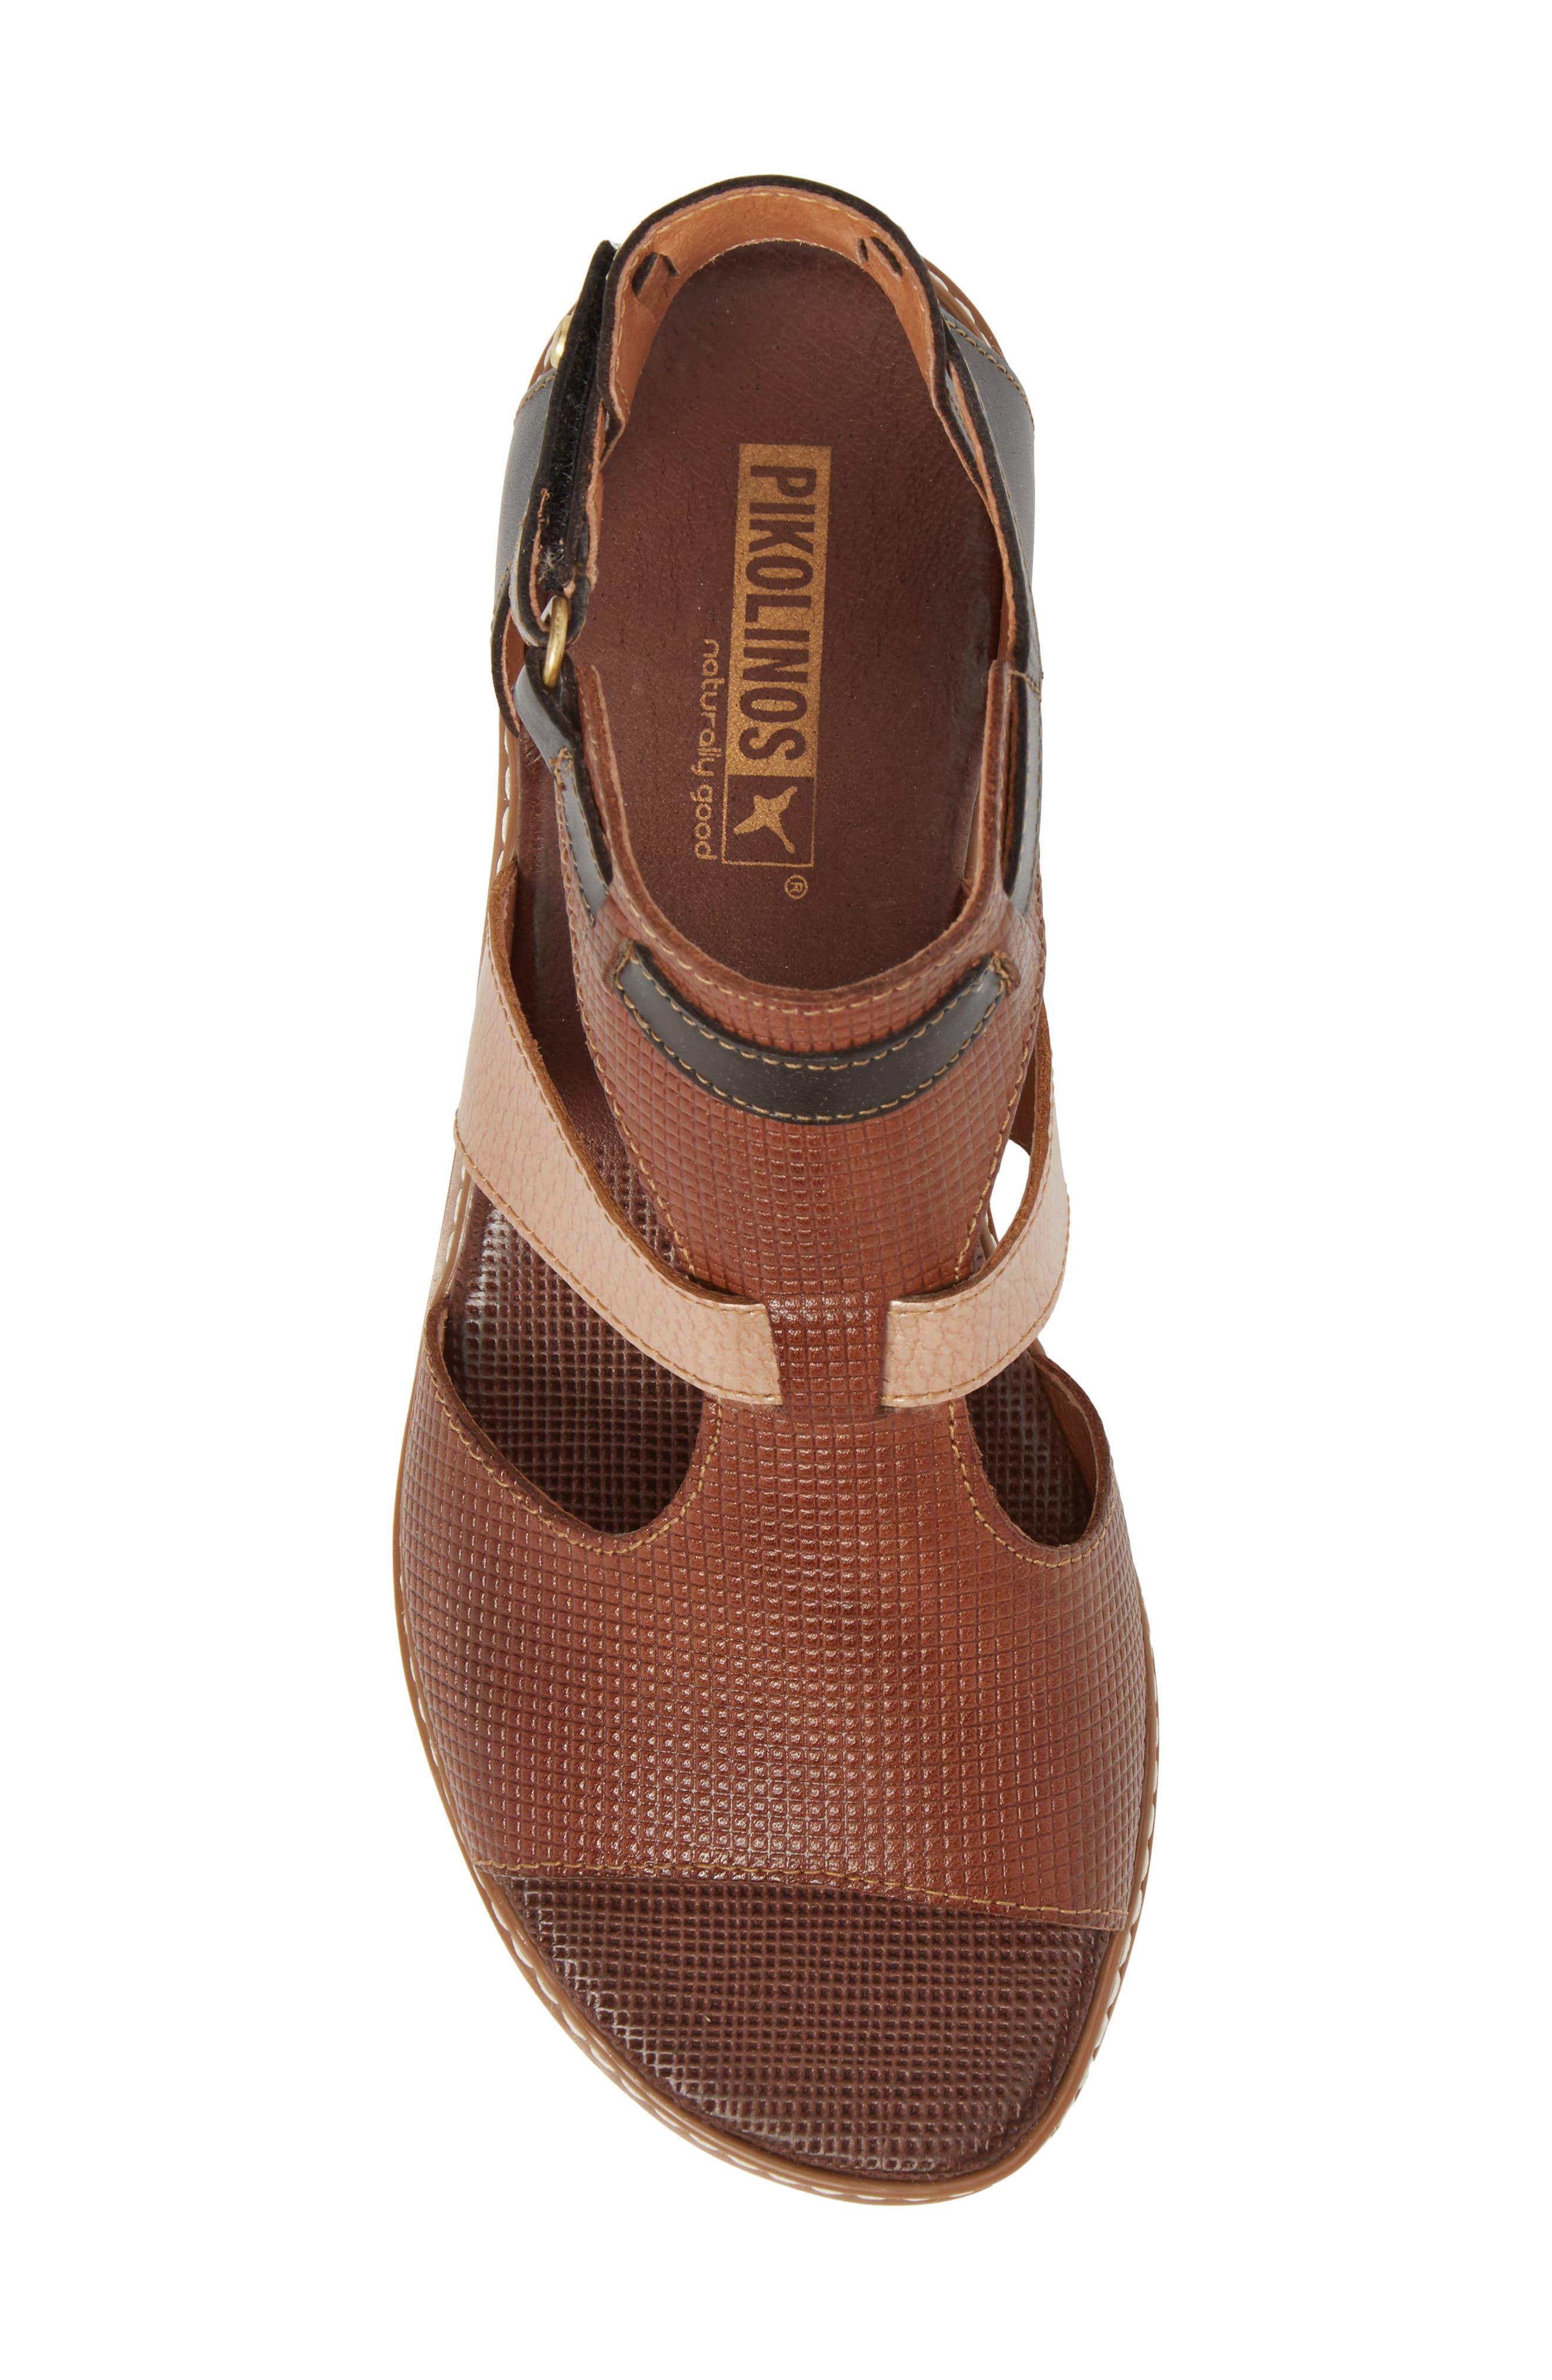 Alcudia Sandal,                             Alternate thumbnail 5, color,                             Cuero Leather